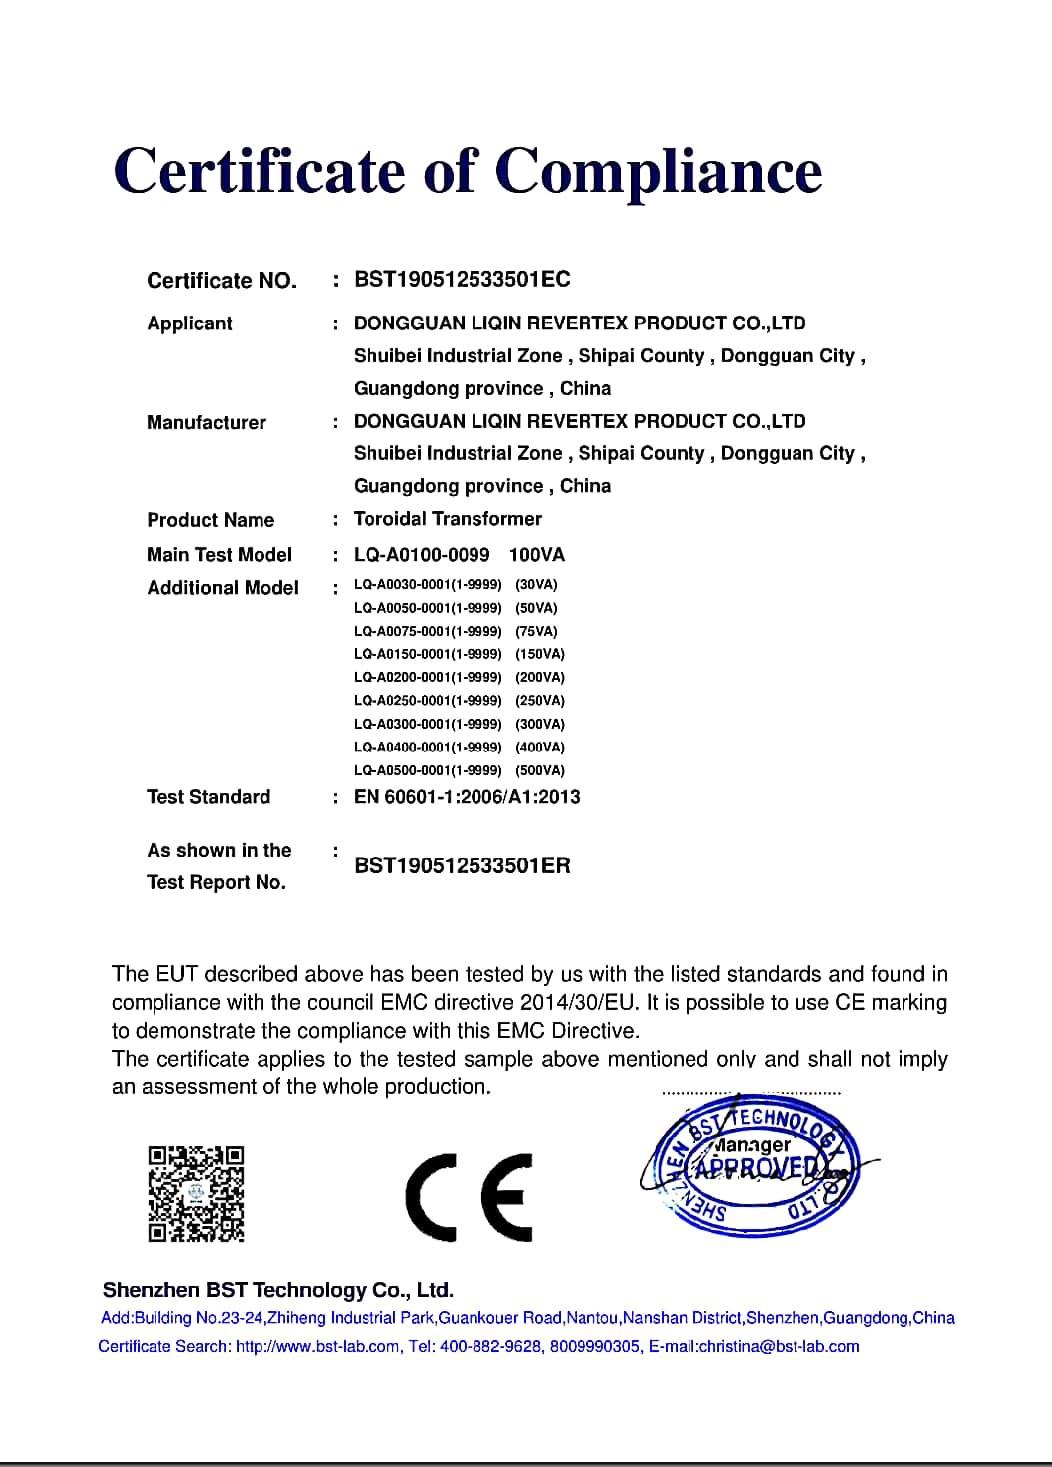 EN 60601-1: 2006 / A1: 2013 (медицинский)